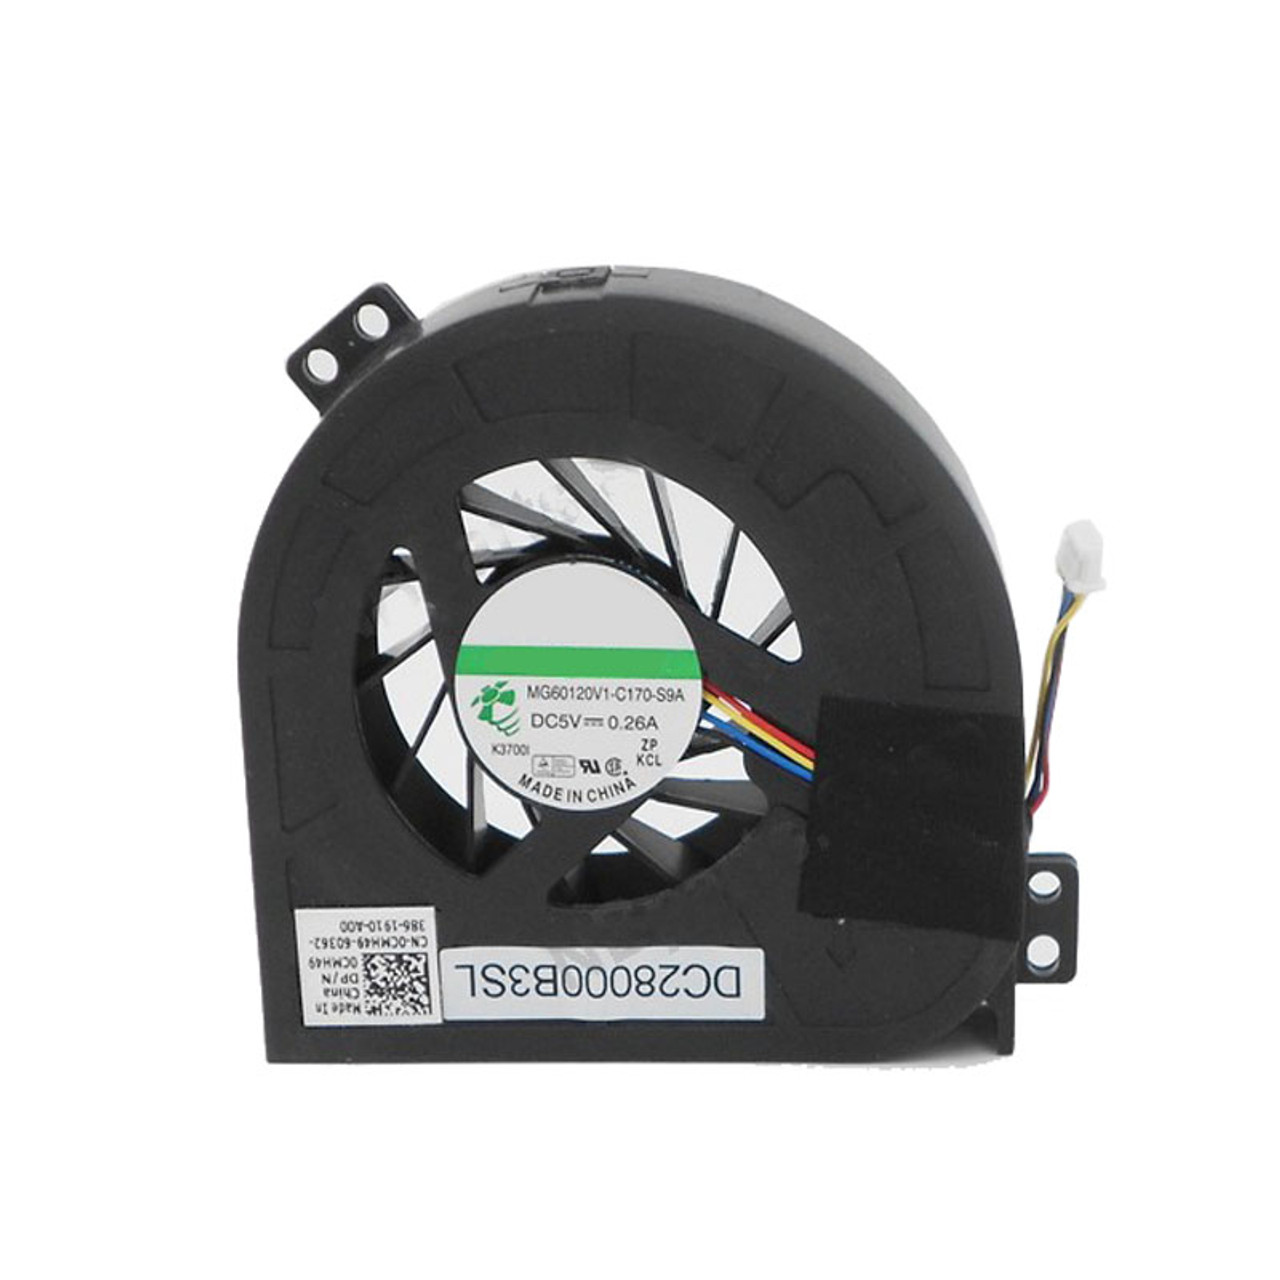 Laptop GPU Fan For DELL Precision M4700 P21F DC28000B3SL MG60120V1-C170-S9A  0CMH49 CMH49 DC5V 0 26A new